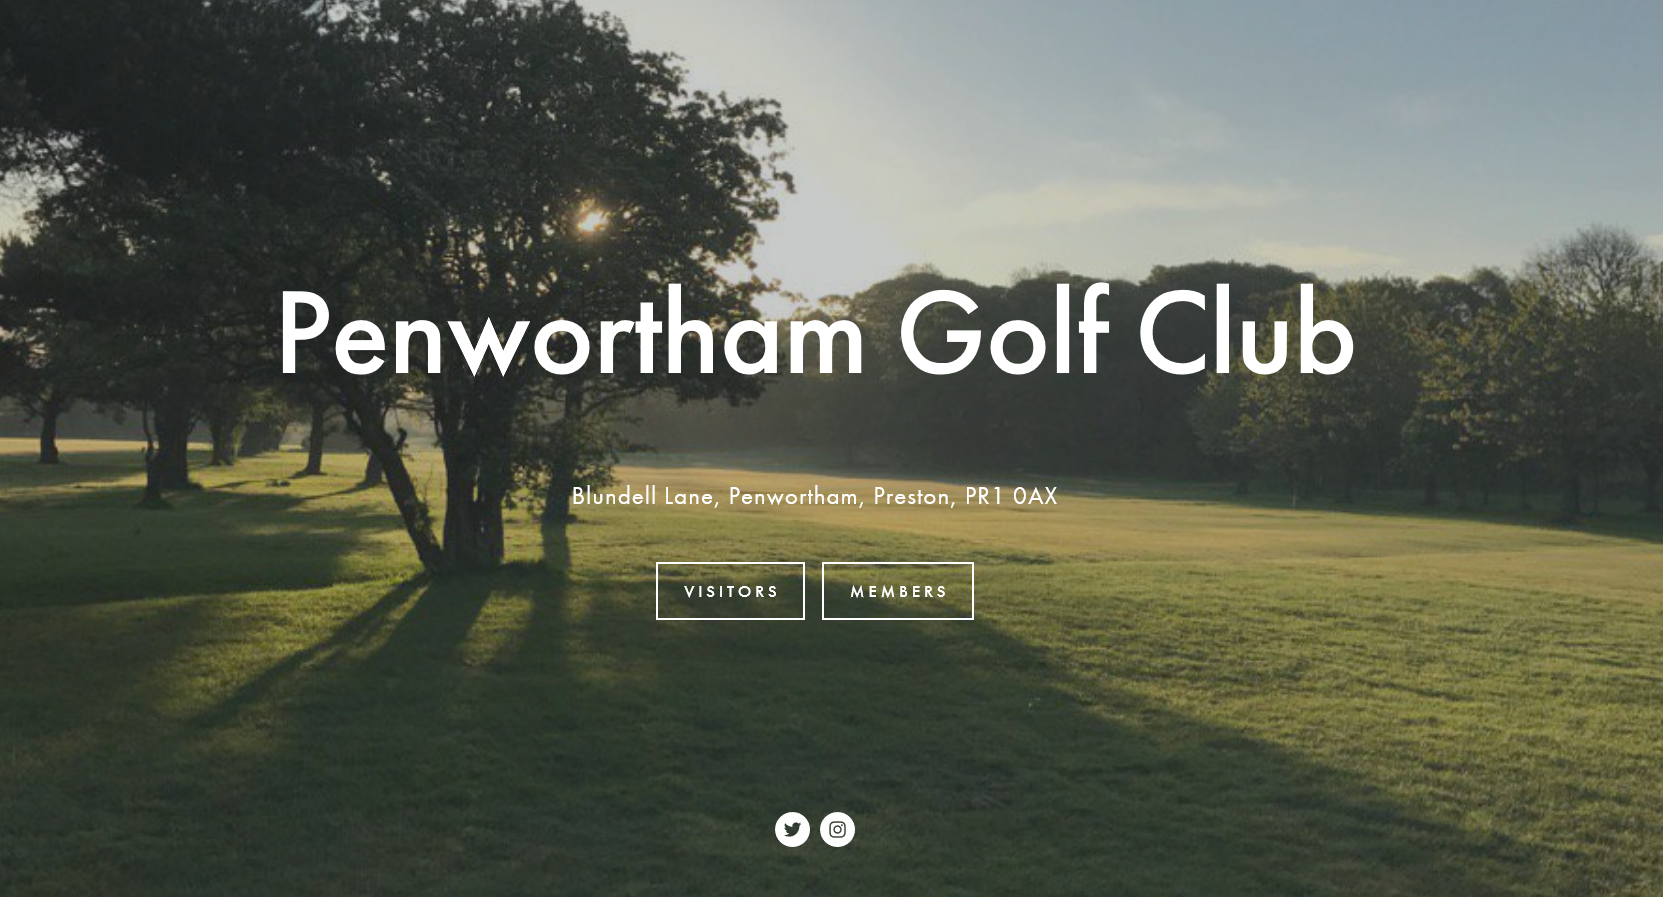 Penwortham golf course